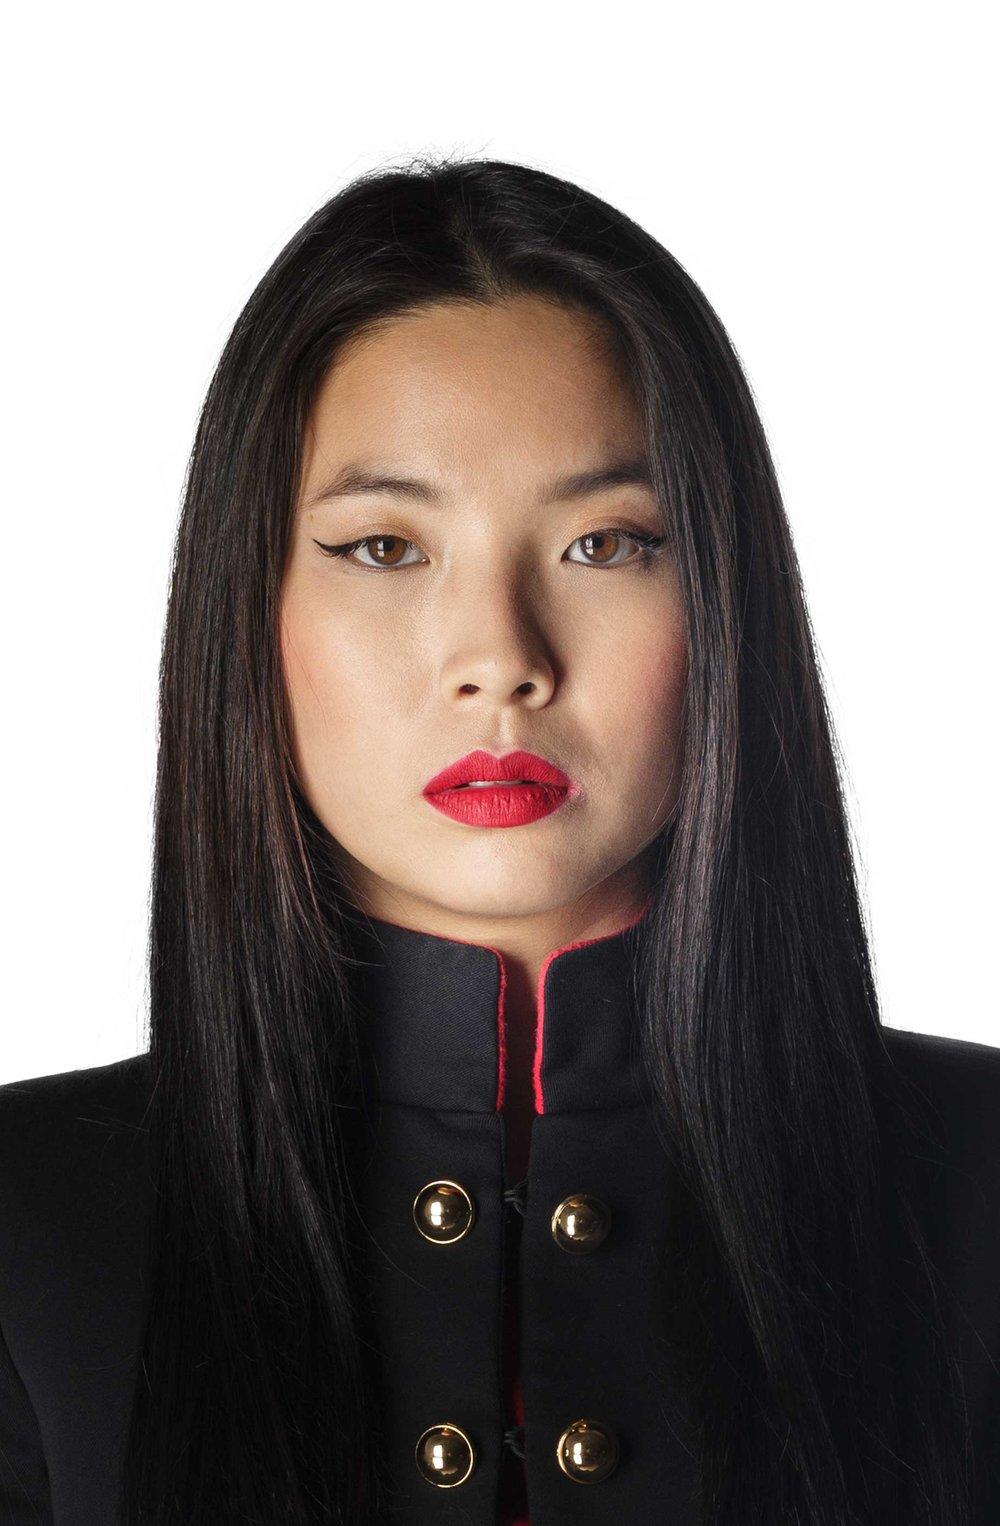 Sra. Zhang